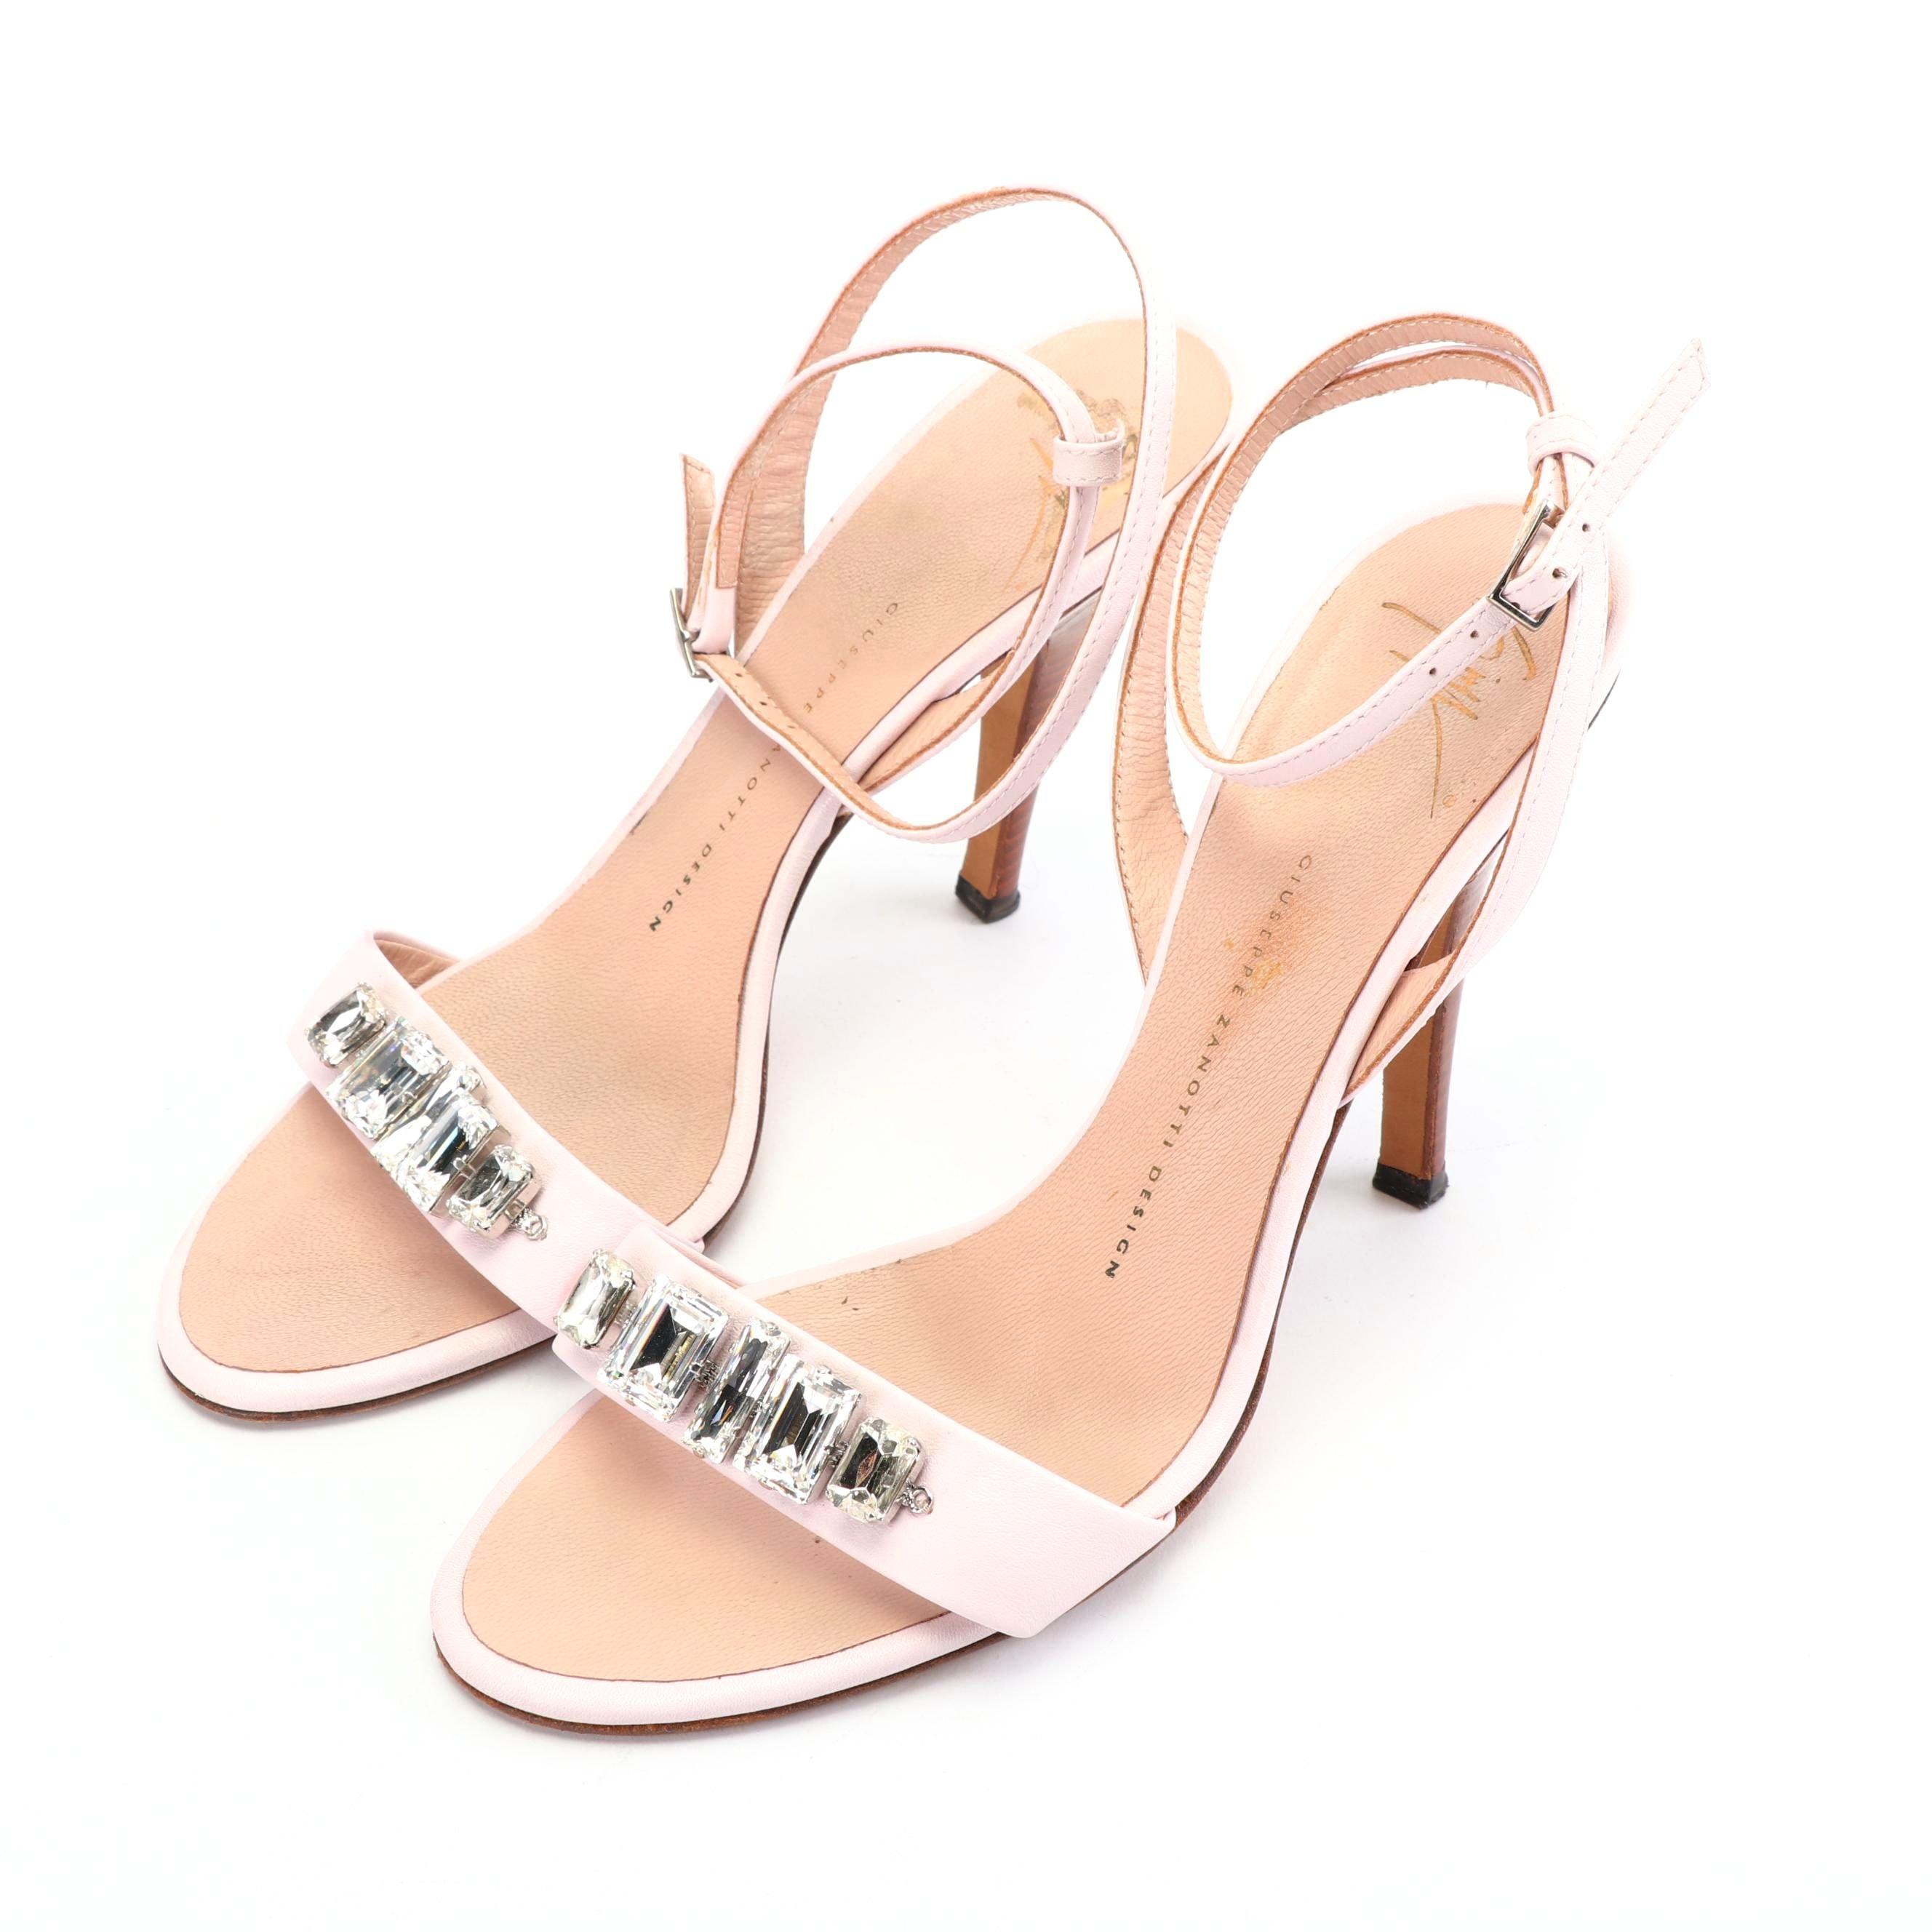 Women's Giuseppe Zanotti Rhinestone Embellished Pink Leather Sandals